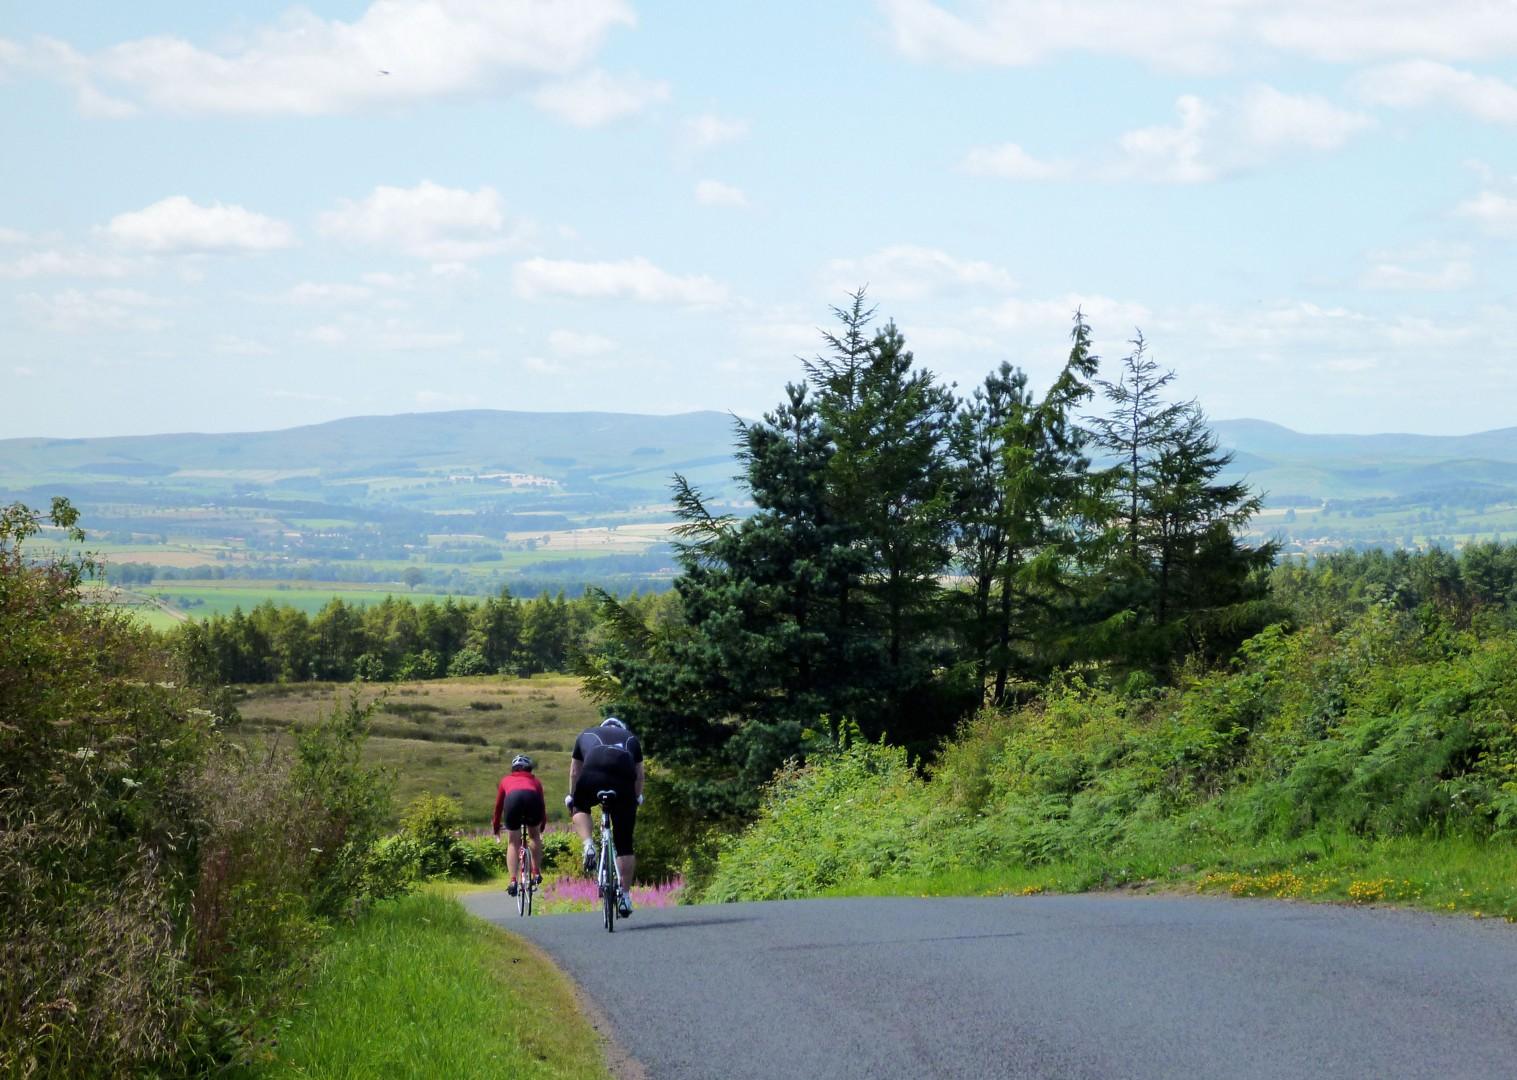 uk-road-cycling-weekend.jpg - UK - Northumberland - Road Cycling